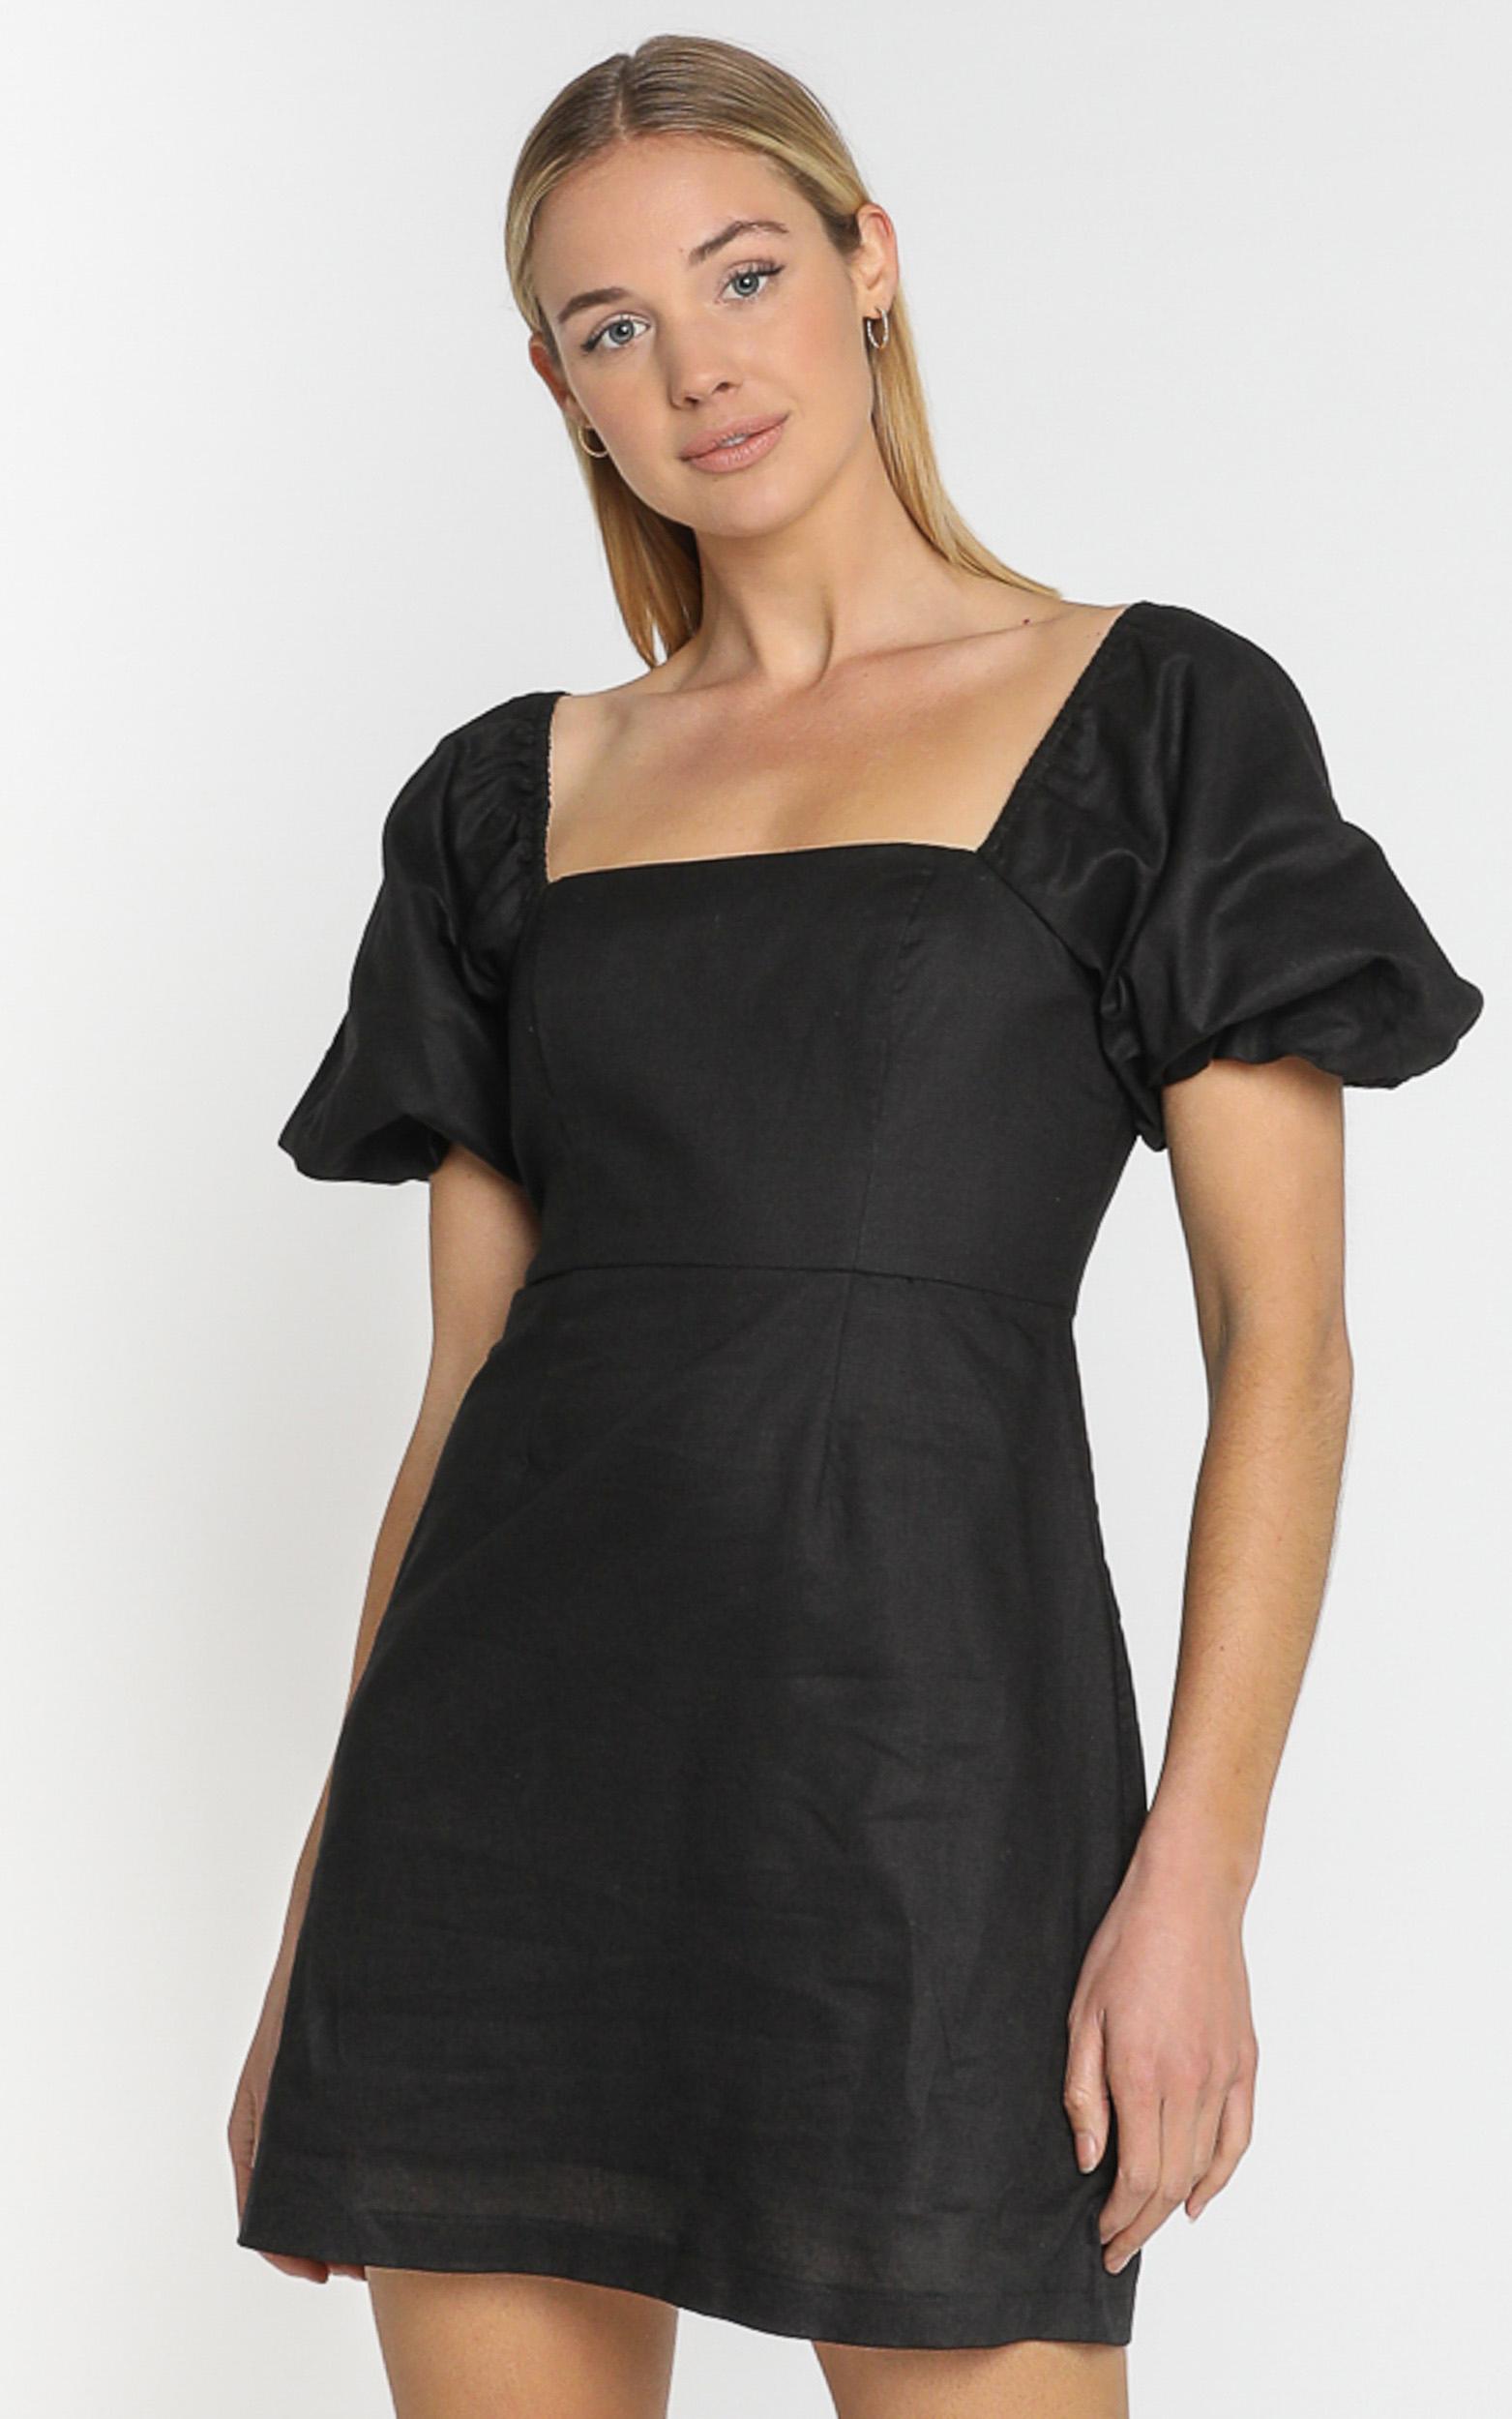 Lulu & Rose - Ari Linen Dress in Black - 4 (XXS), Black, hi-res image number null